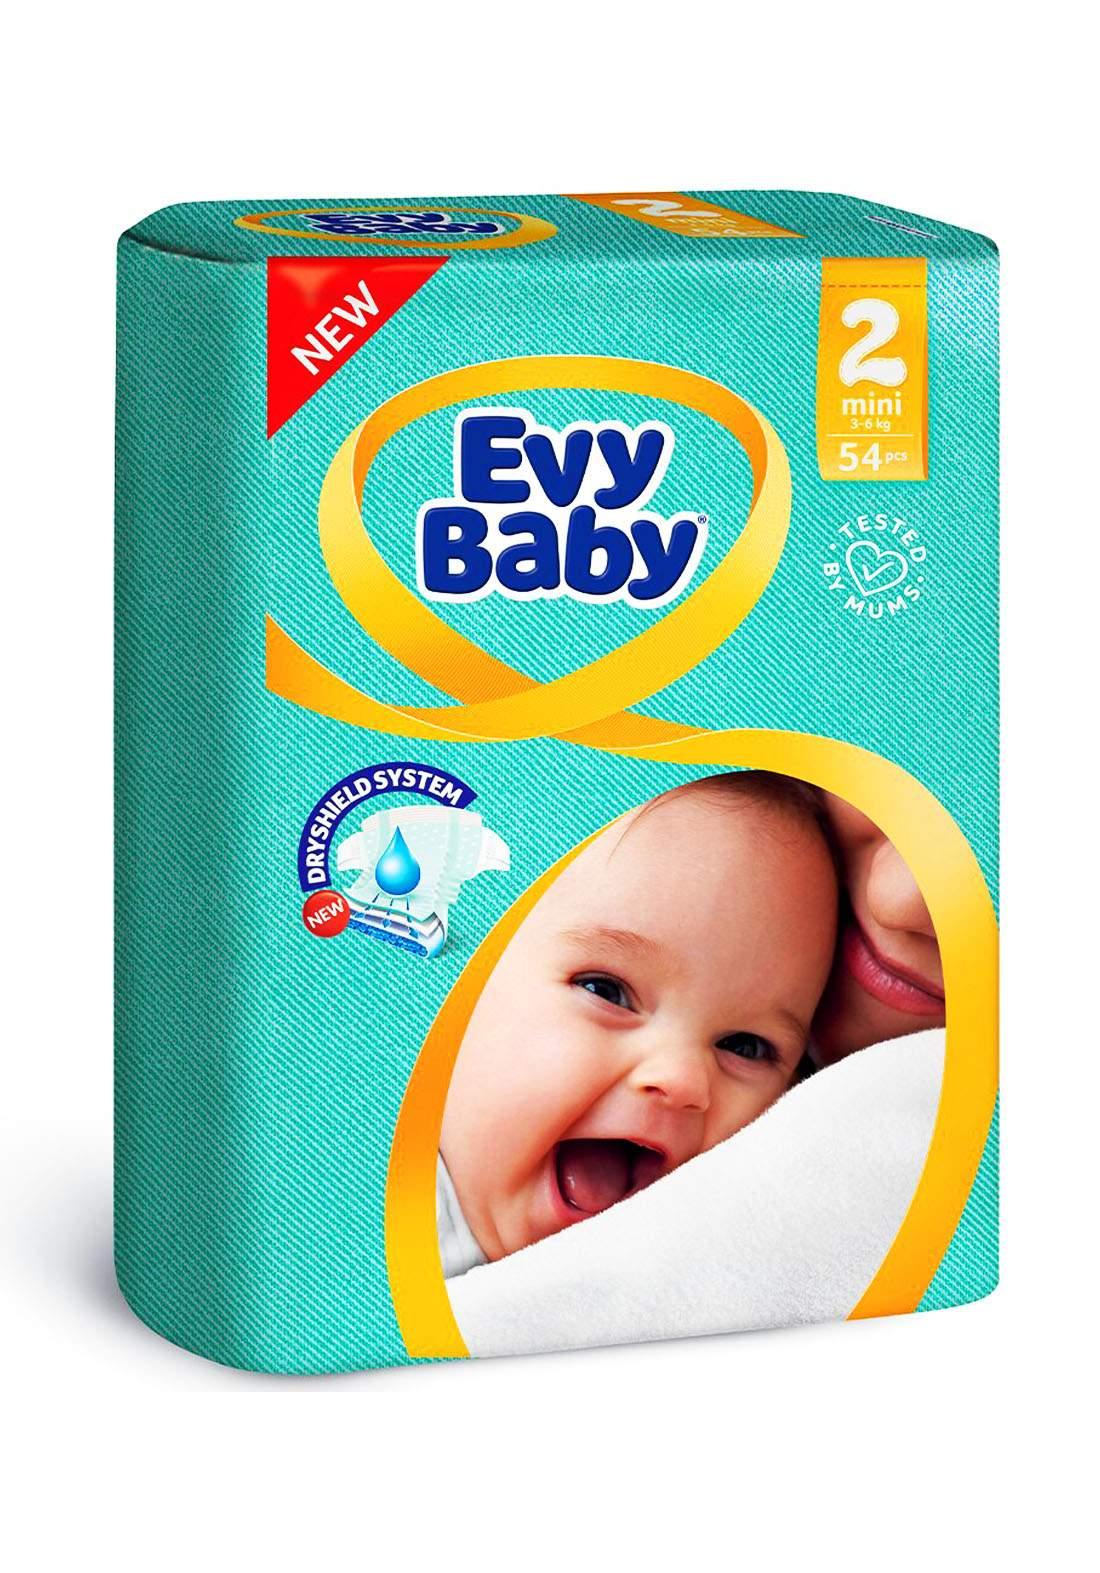 Evy Baby Diapers 2 Mini 3-6 Kg 54 Pcs 2 حفاضات ايفي بيبي للاطفال عادي رقم